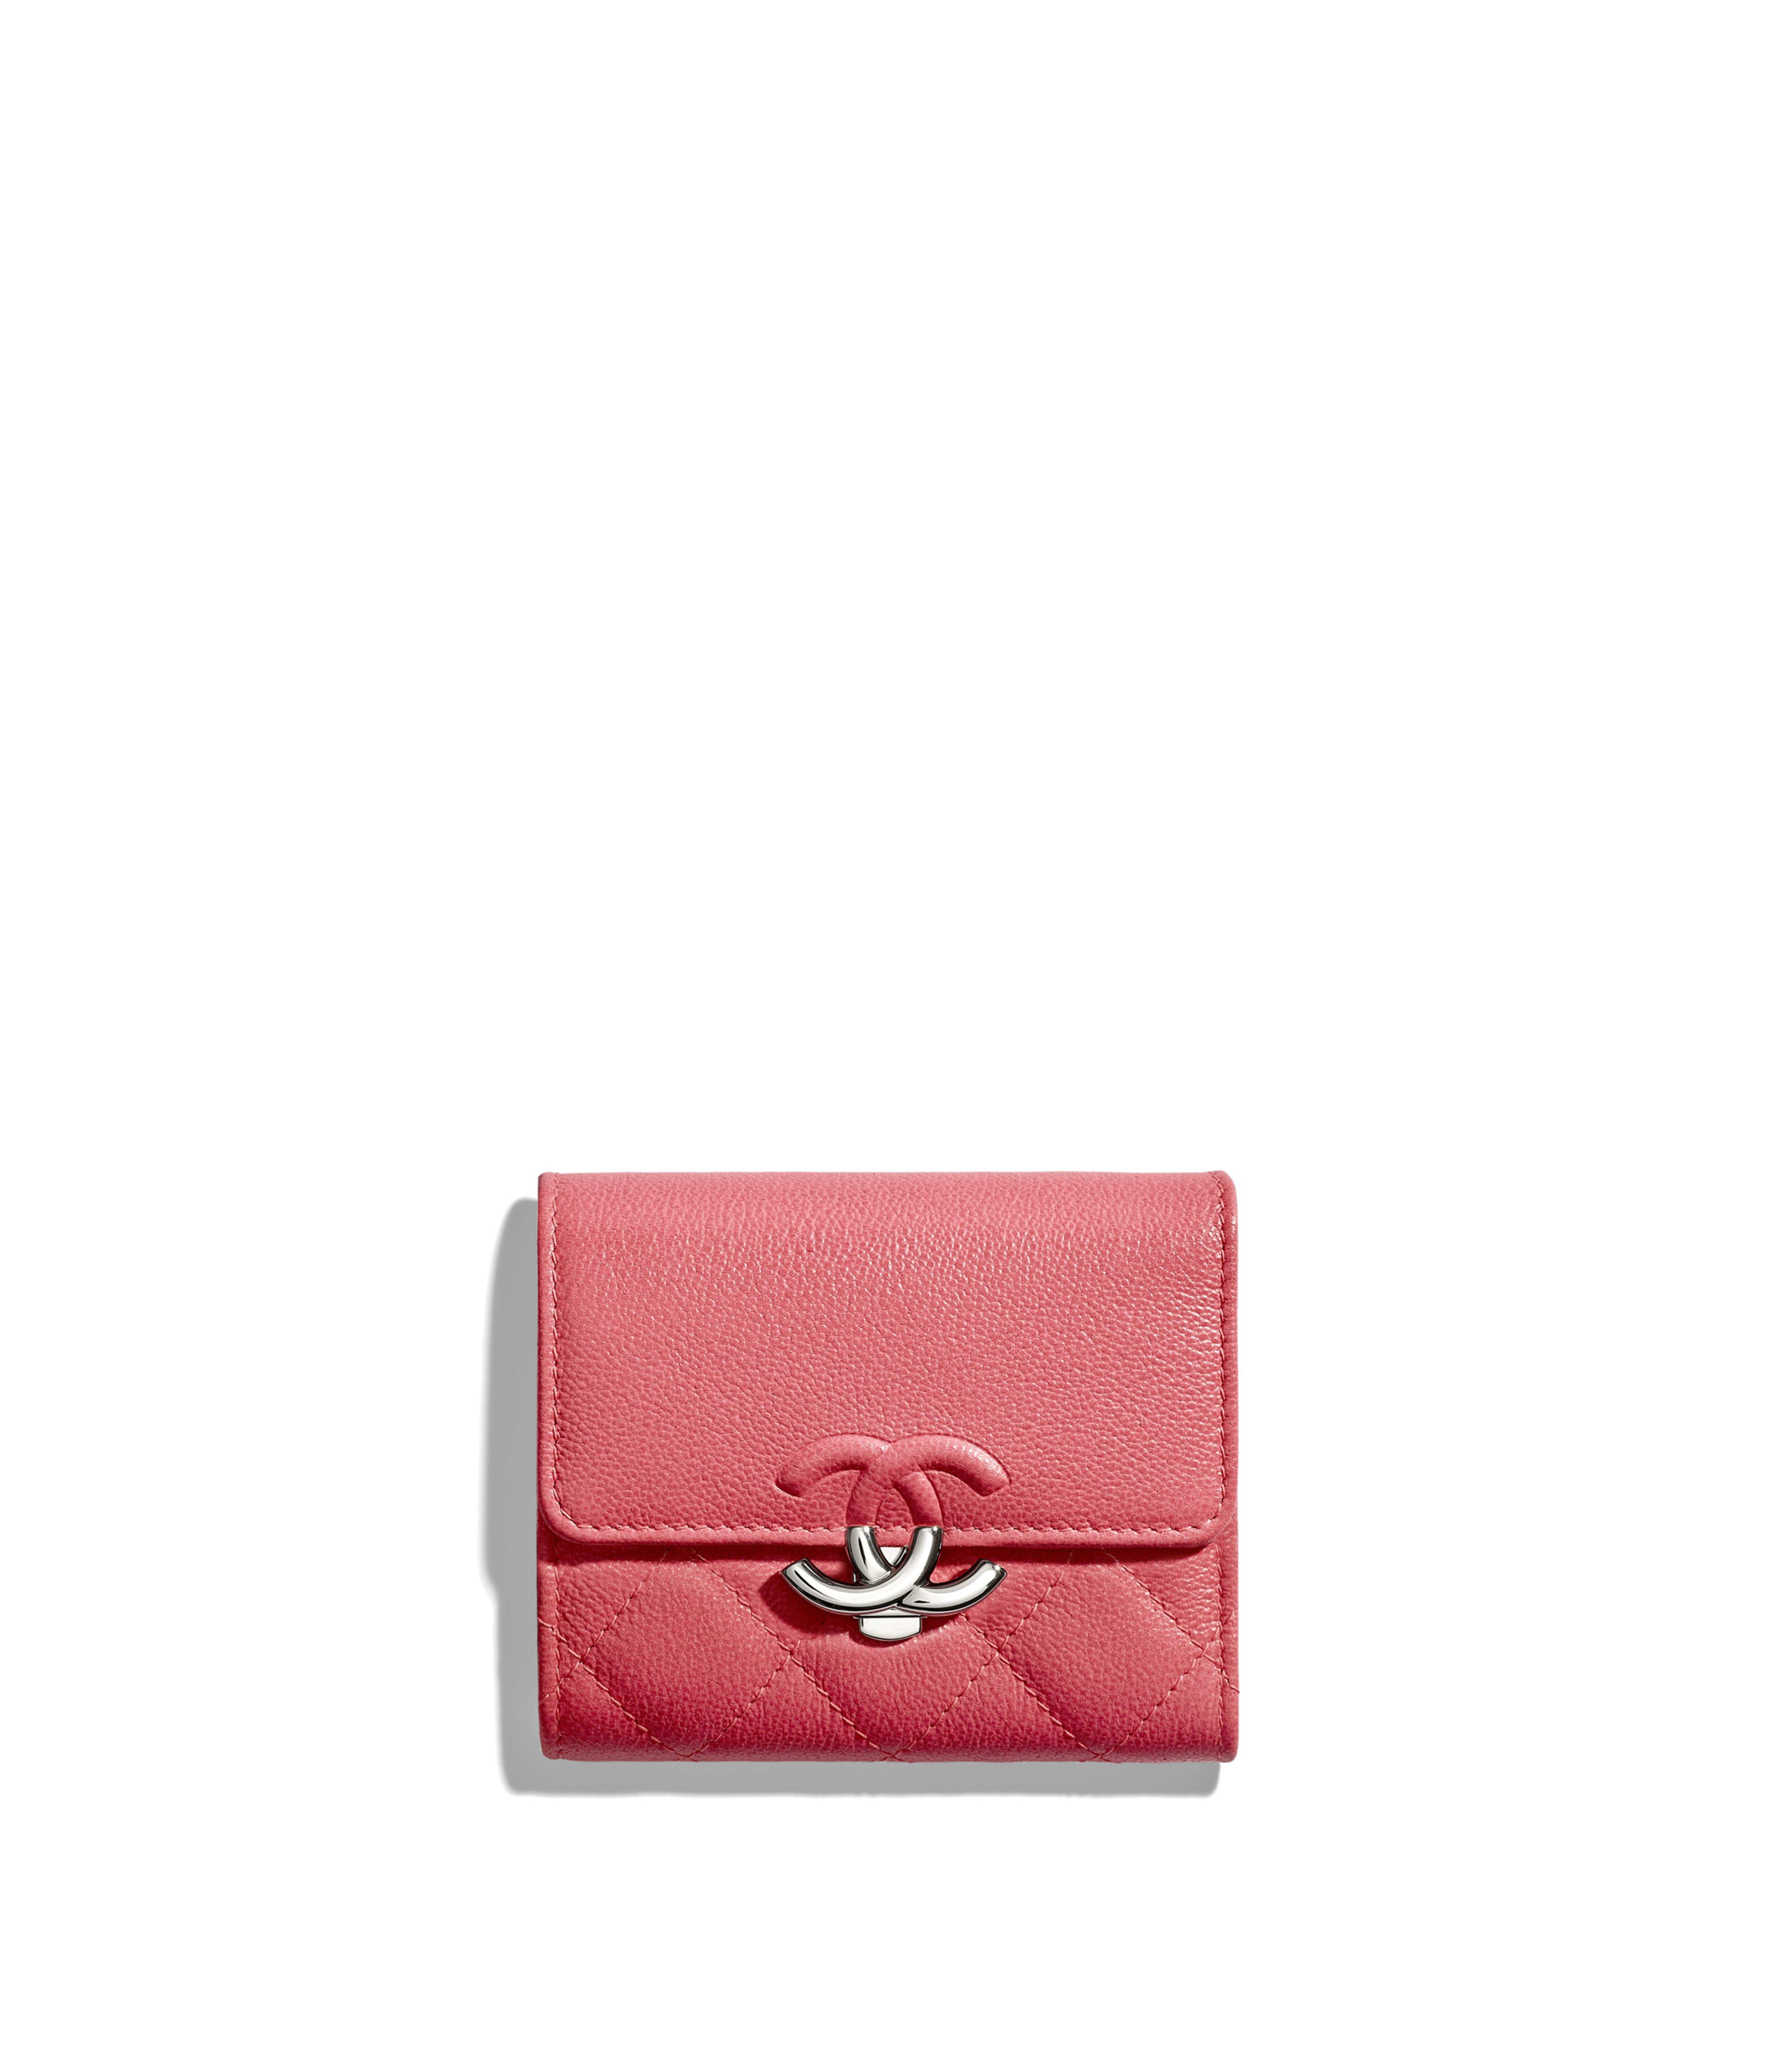 cae7d865880 Small Flap Wallet Grained Calfskin   Silver-Tone Metal, Pink Ref.  AP0010B00035N0412